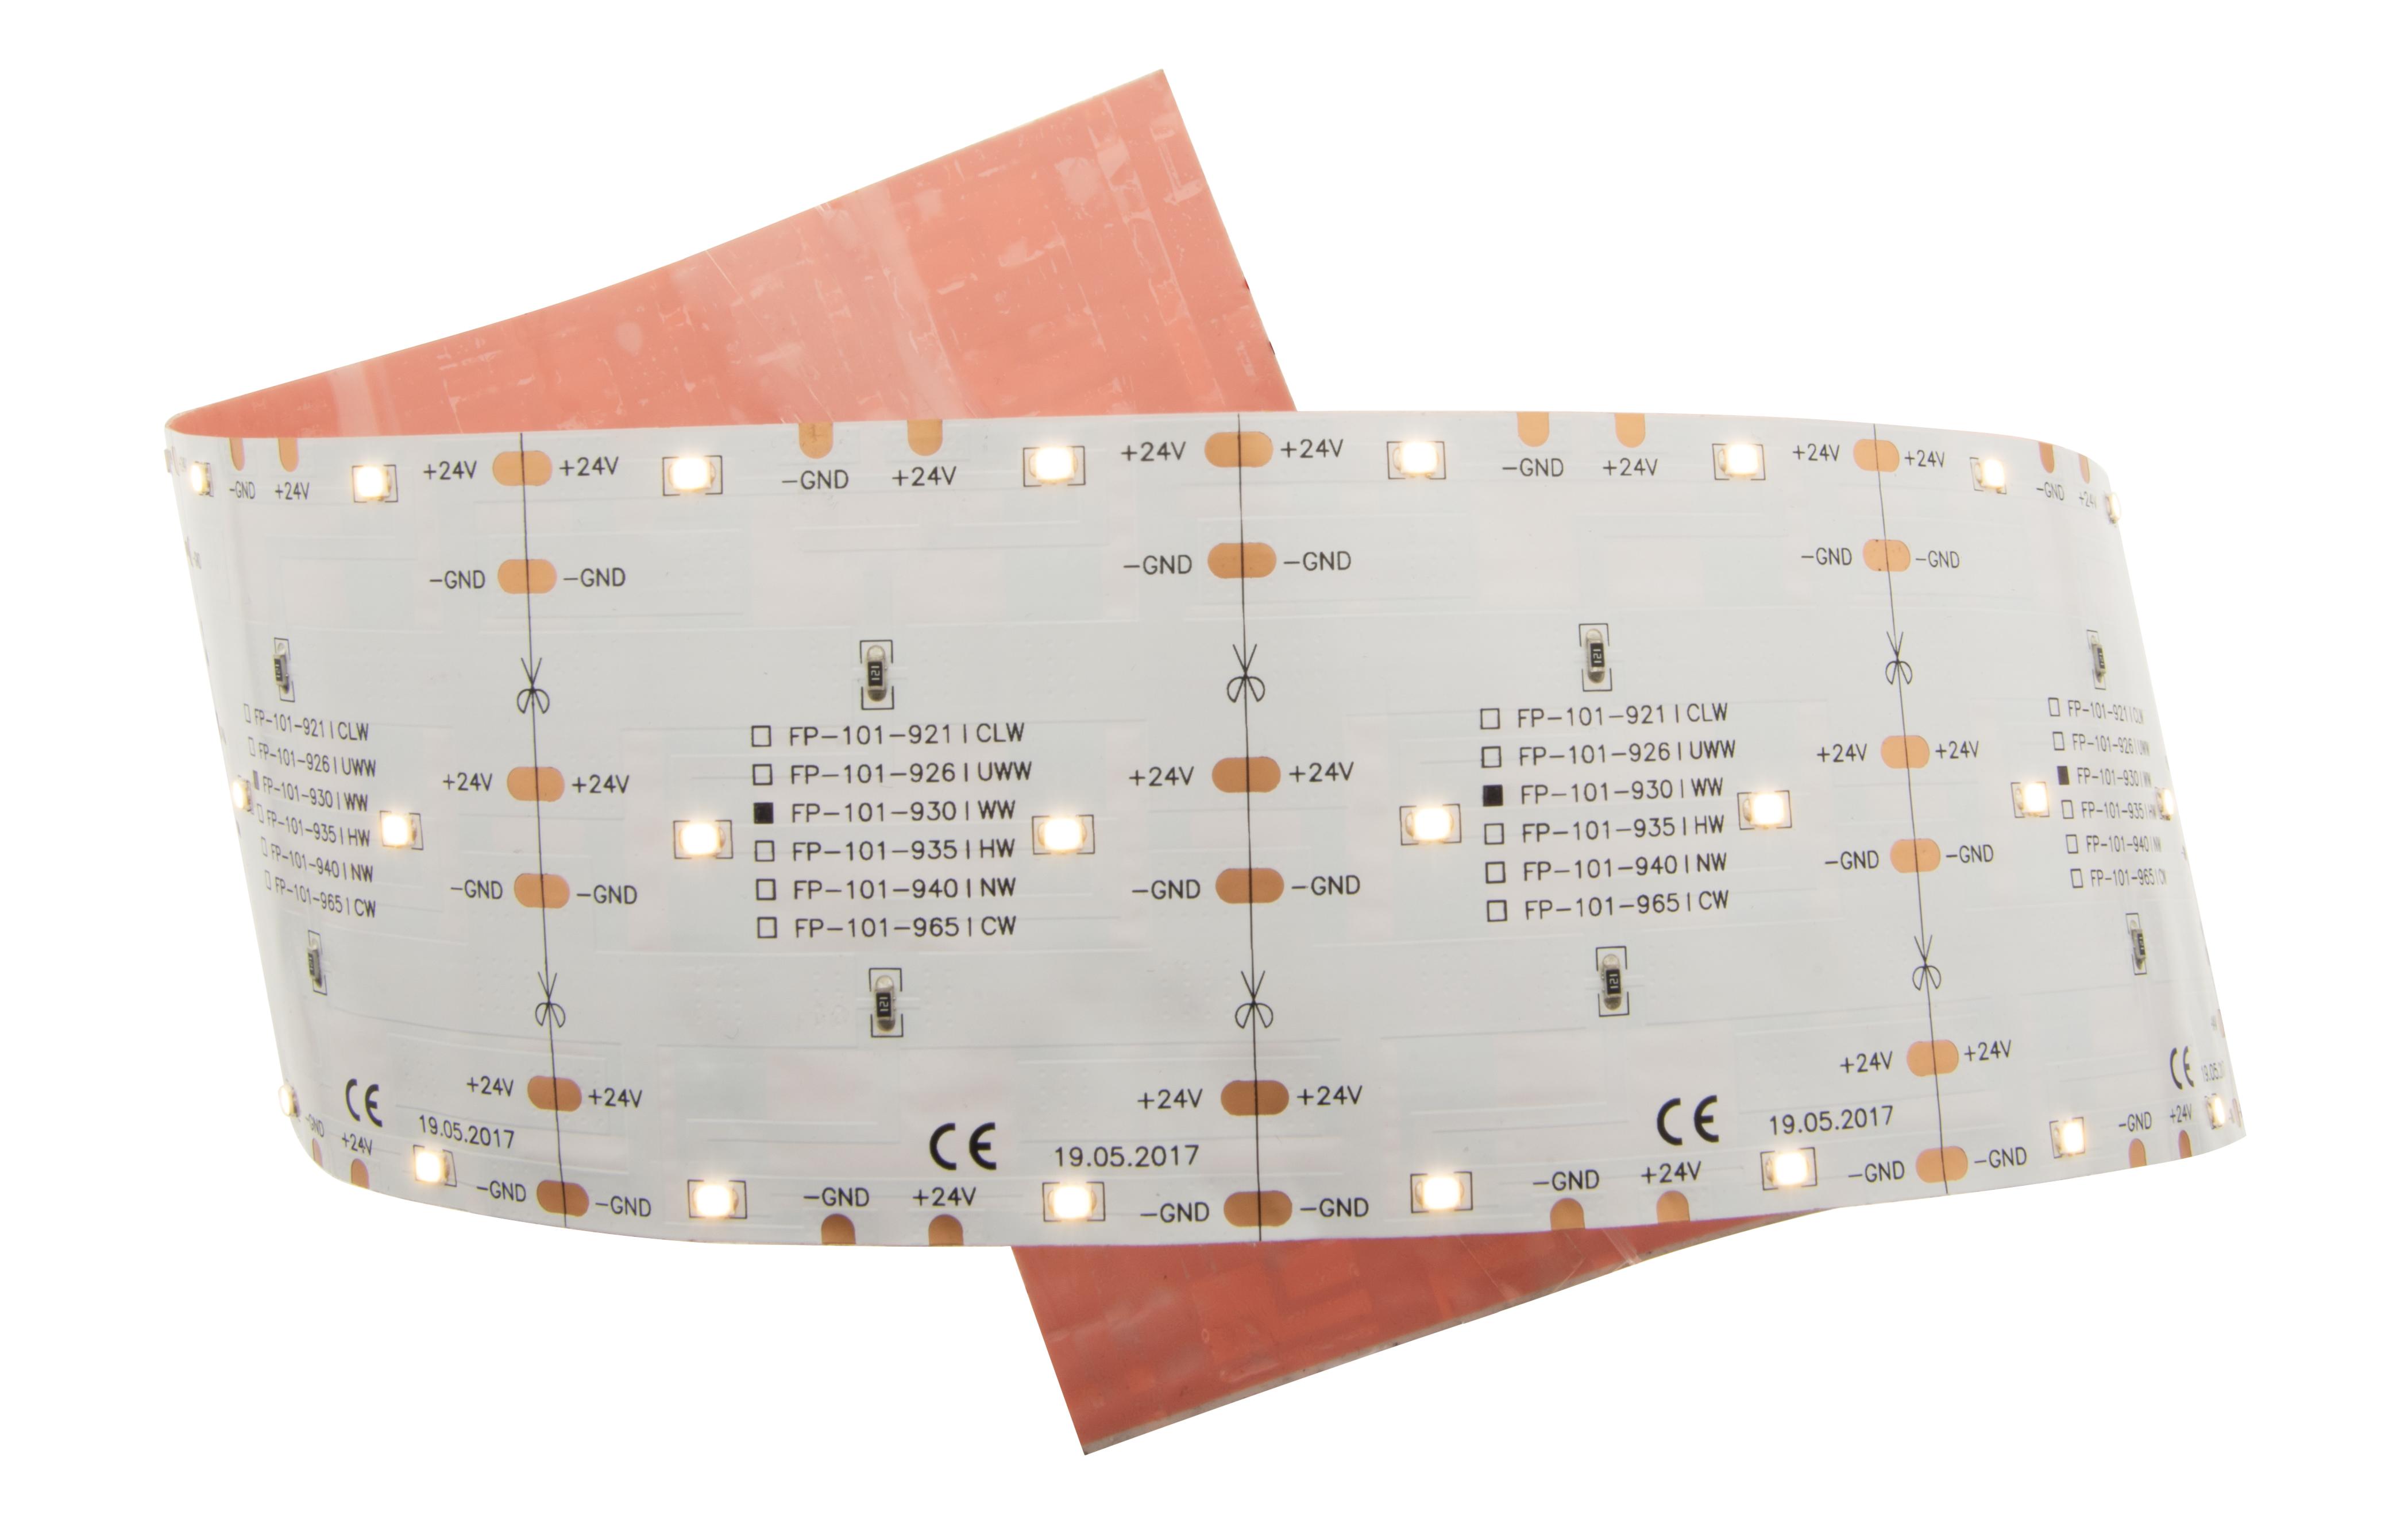 1 Stk LED Flexboard 7 CW (Kalt Weiss) - IP20, CRI/RA 90+ LIFP101965